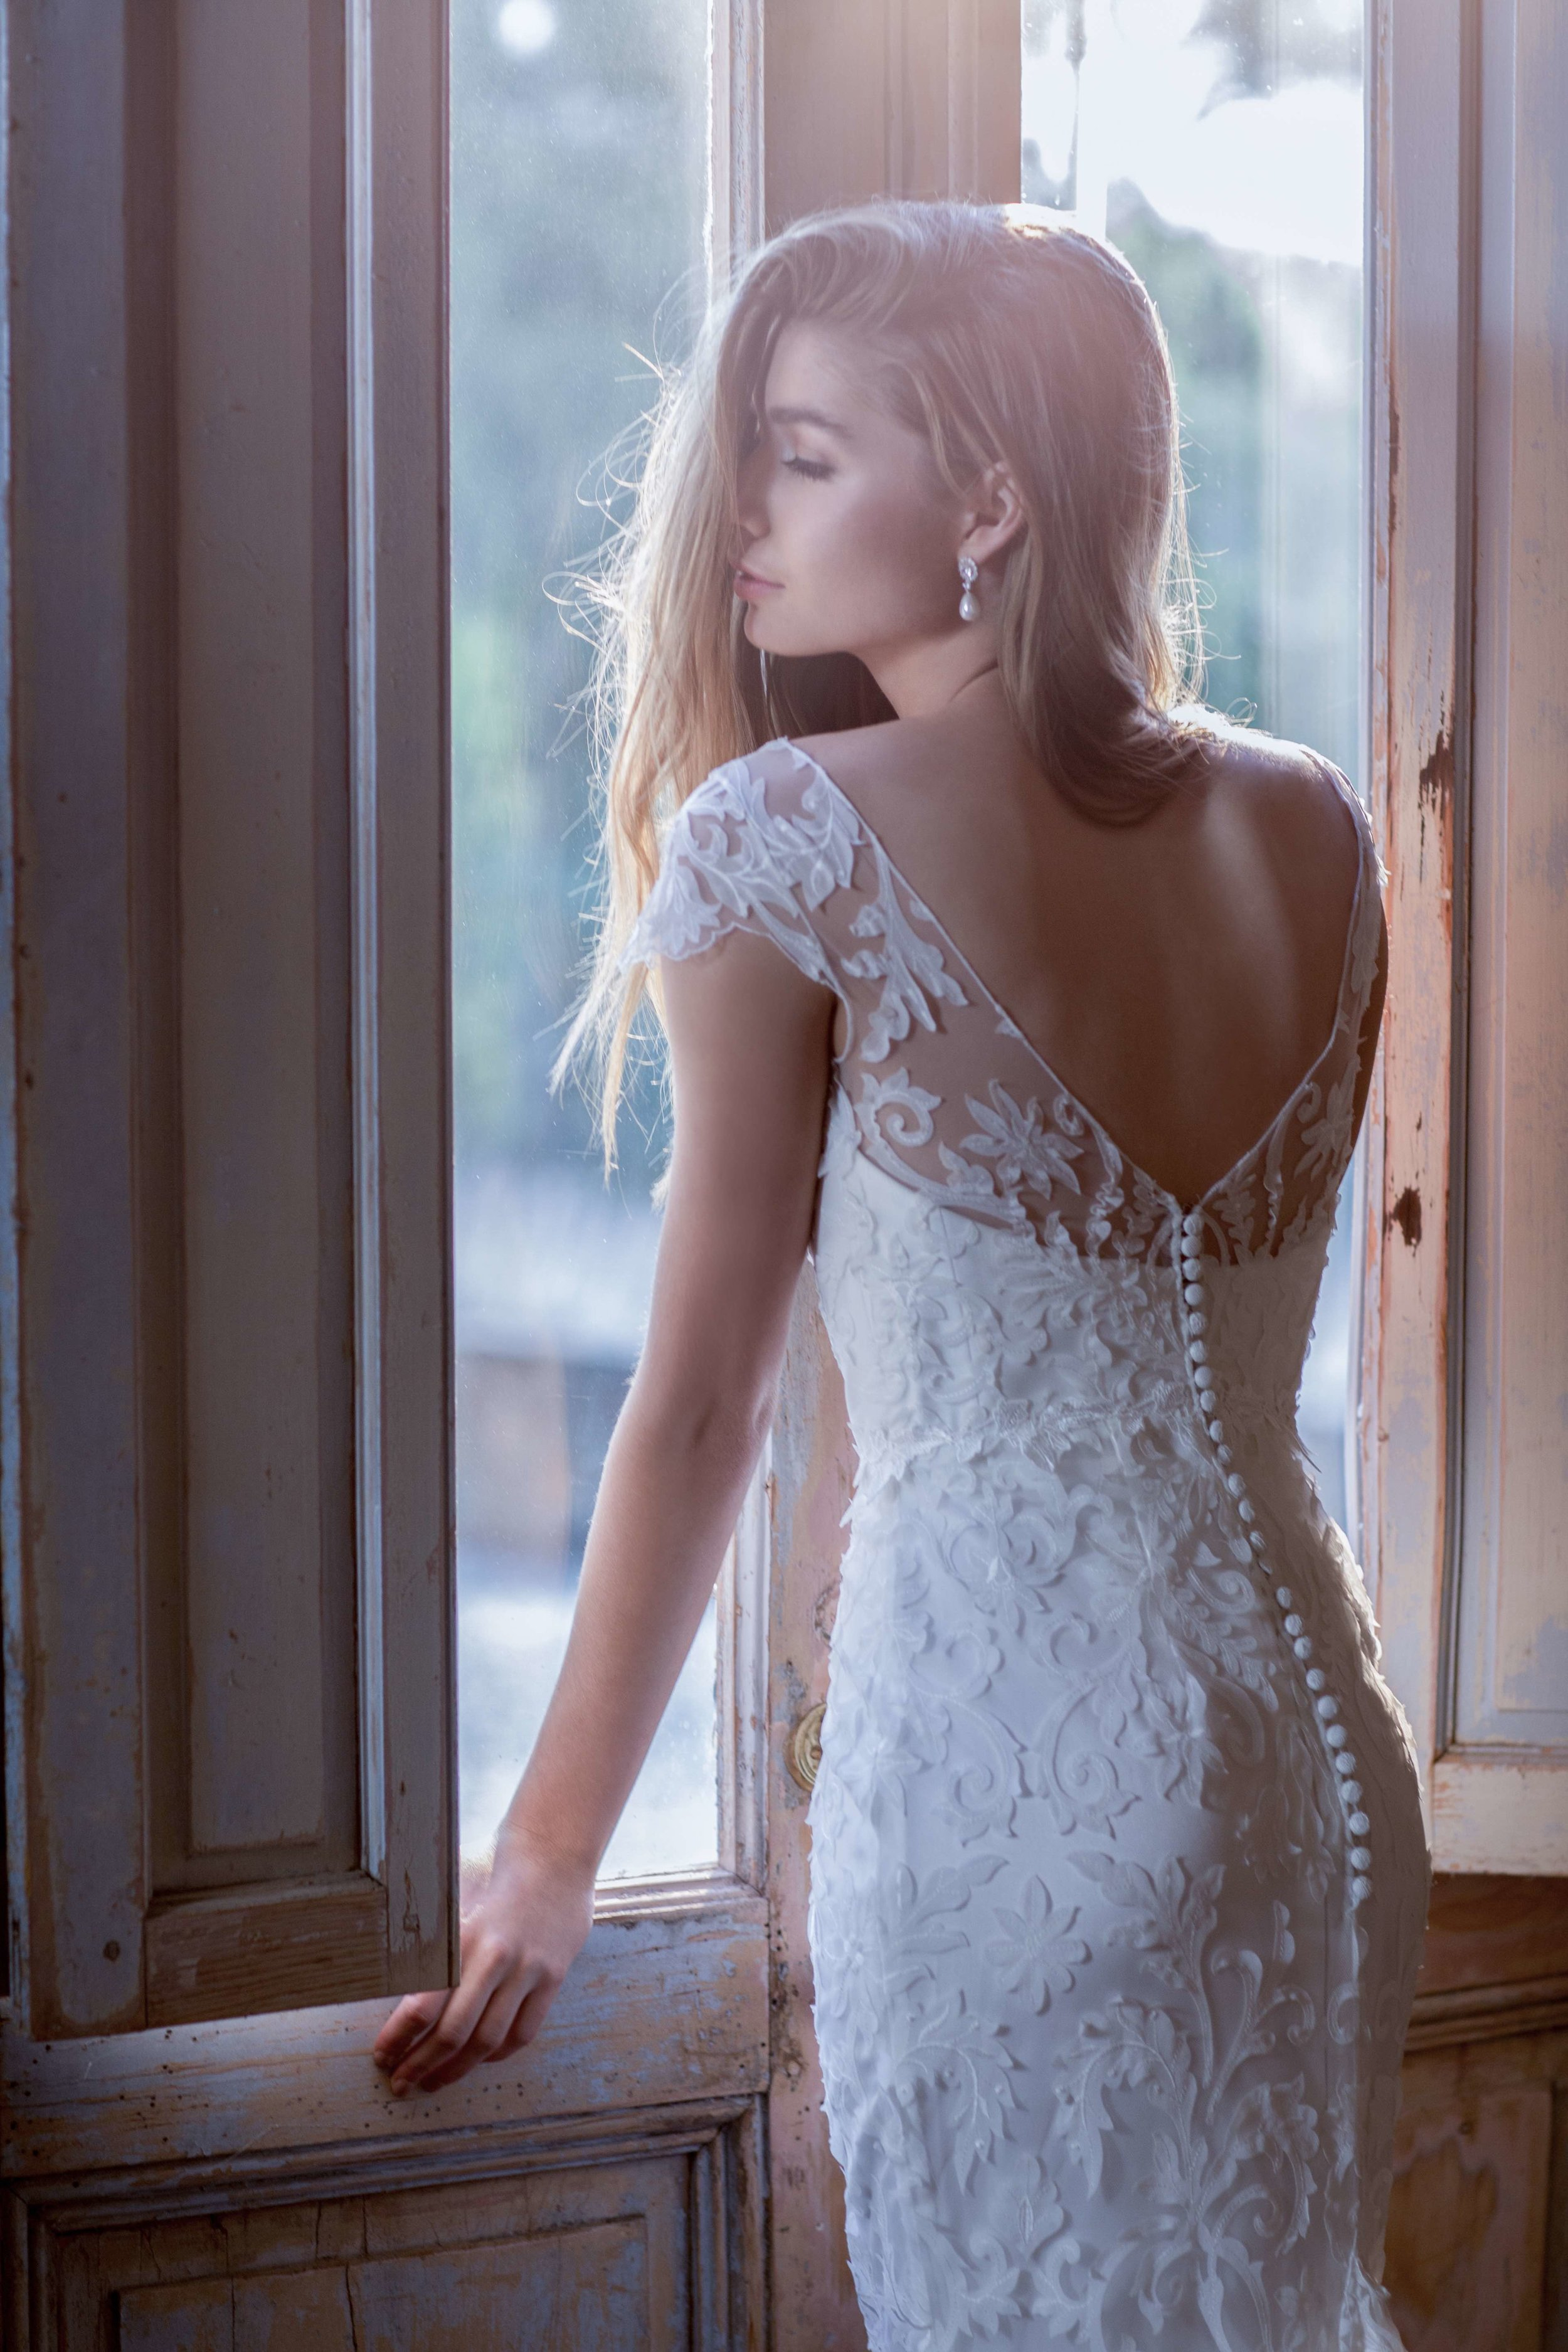 Ceremony Collection_Windsor Dress_image 3_1mb.jpg